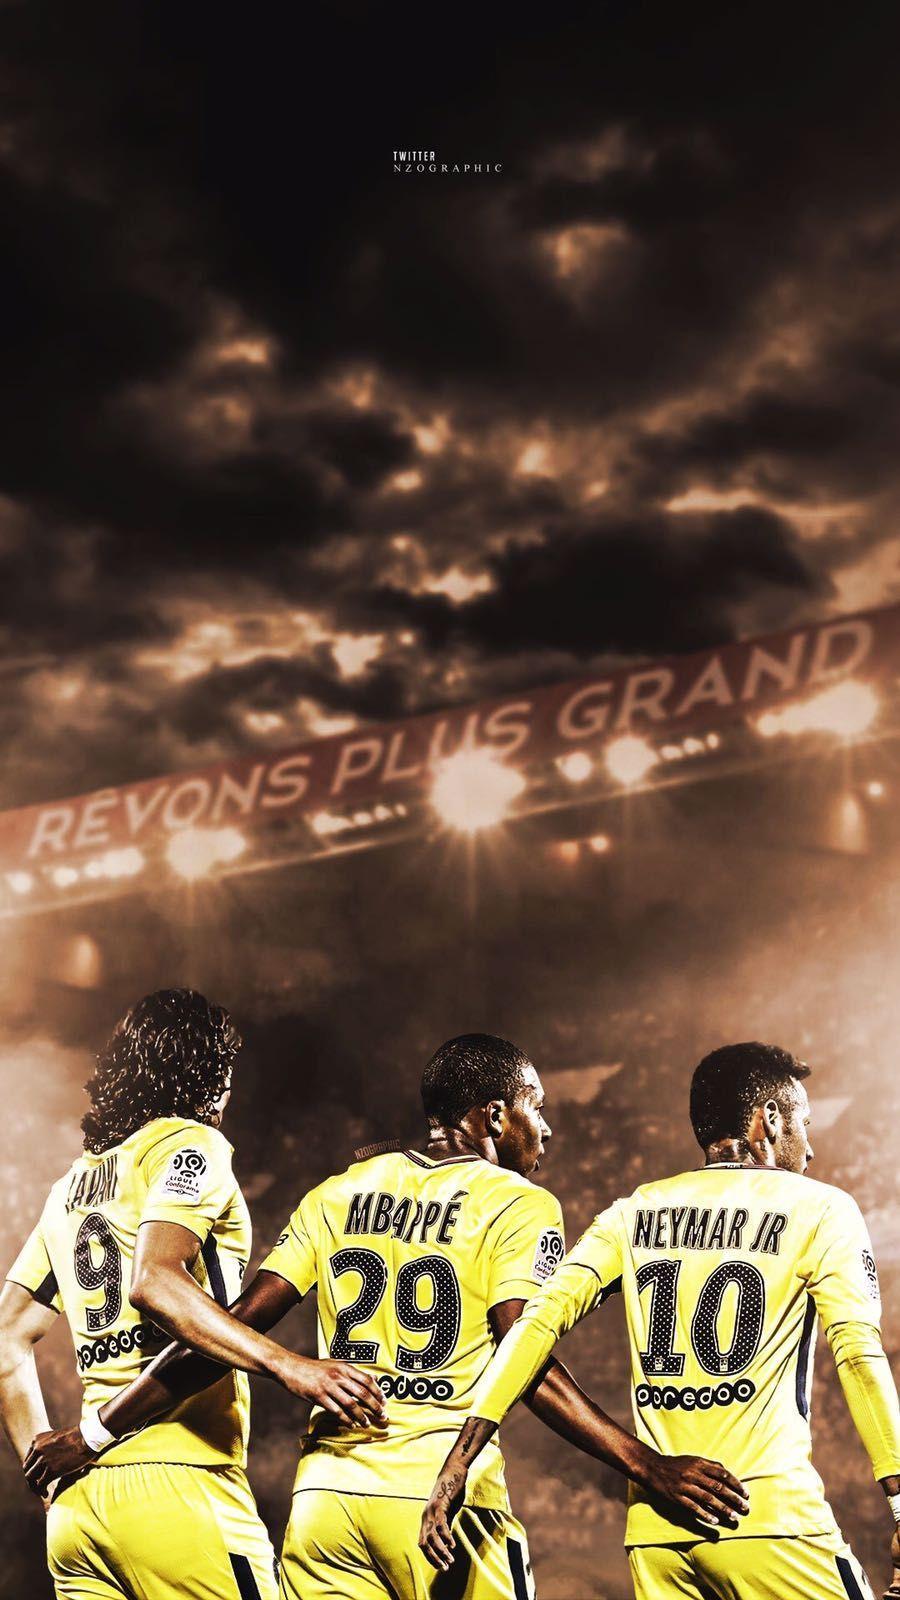 Trio CMN ( Cavani Mbappe Neymar) | Foot | Pinterest | Neymar, Neymar …